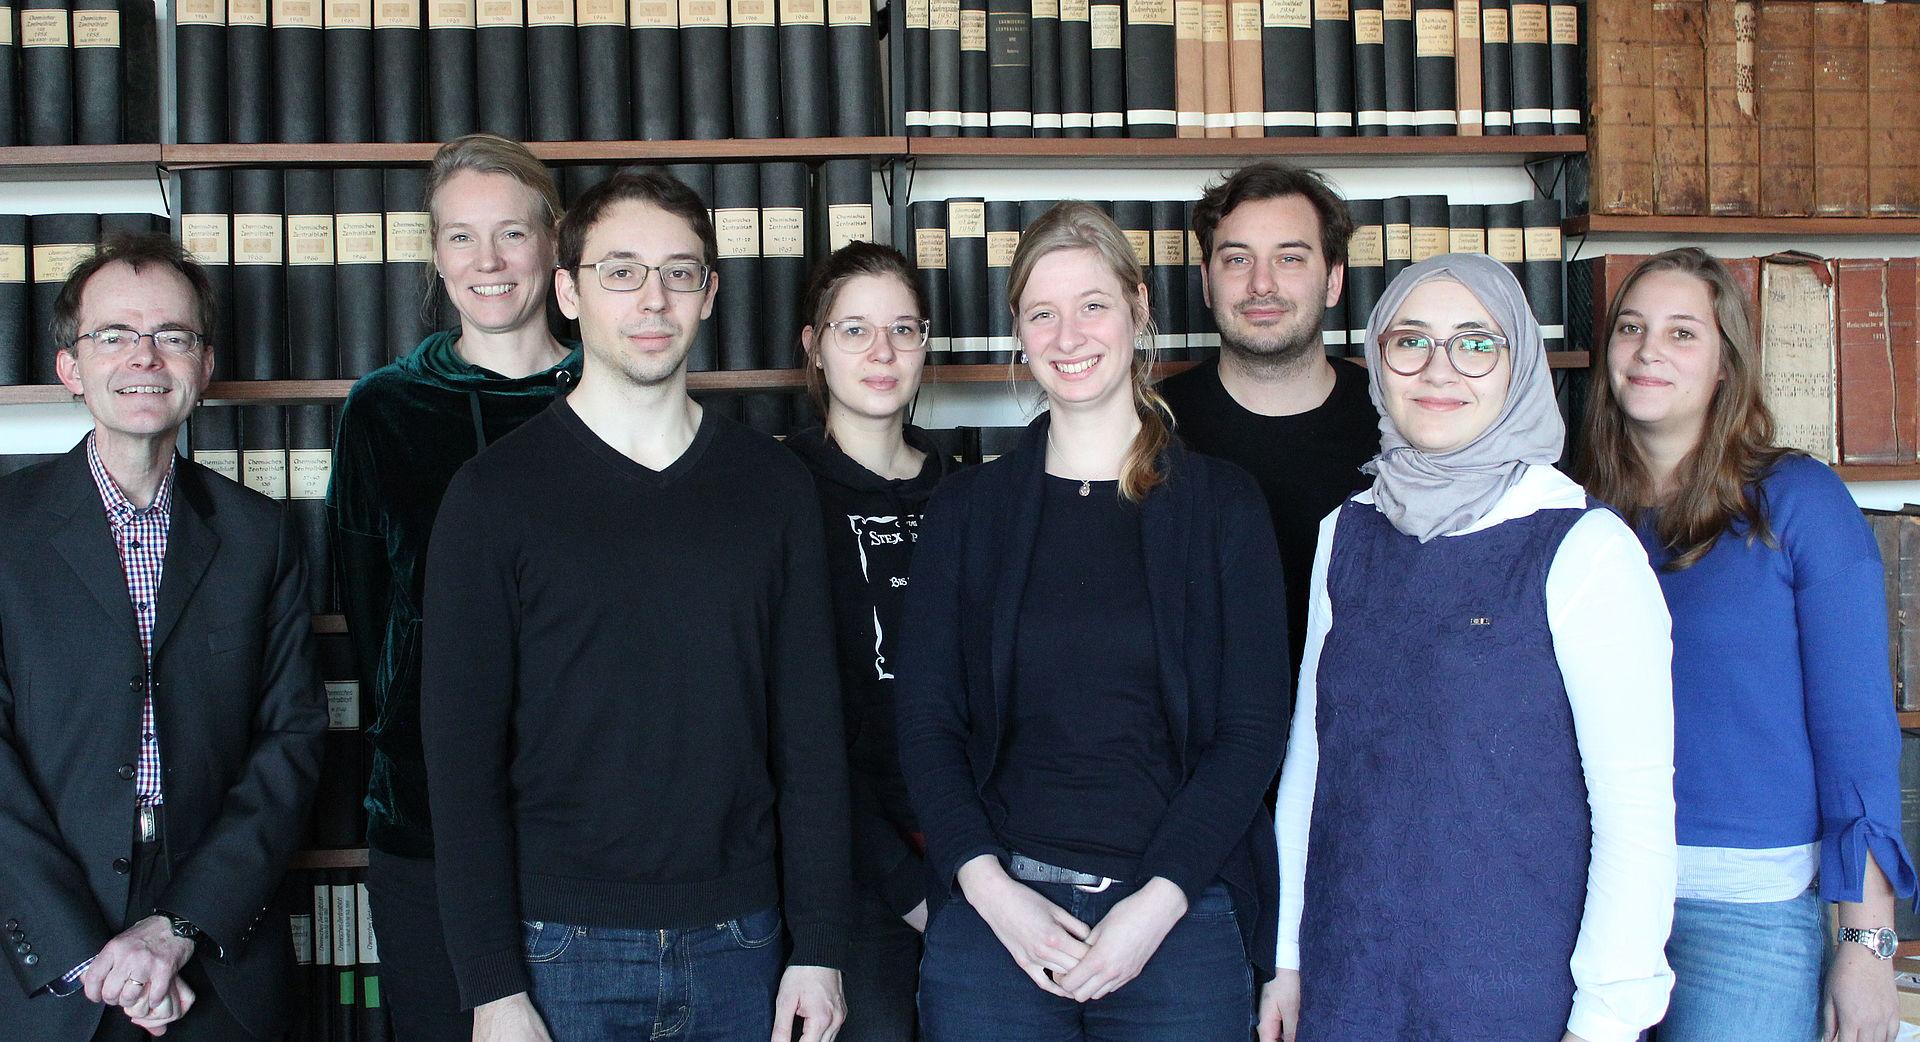 Gruppenfoto AK Wätzig